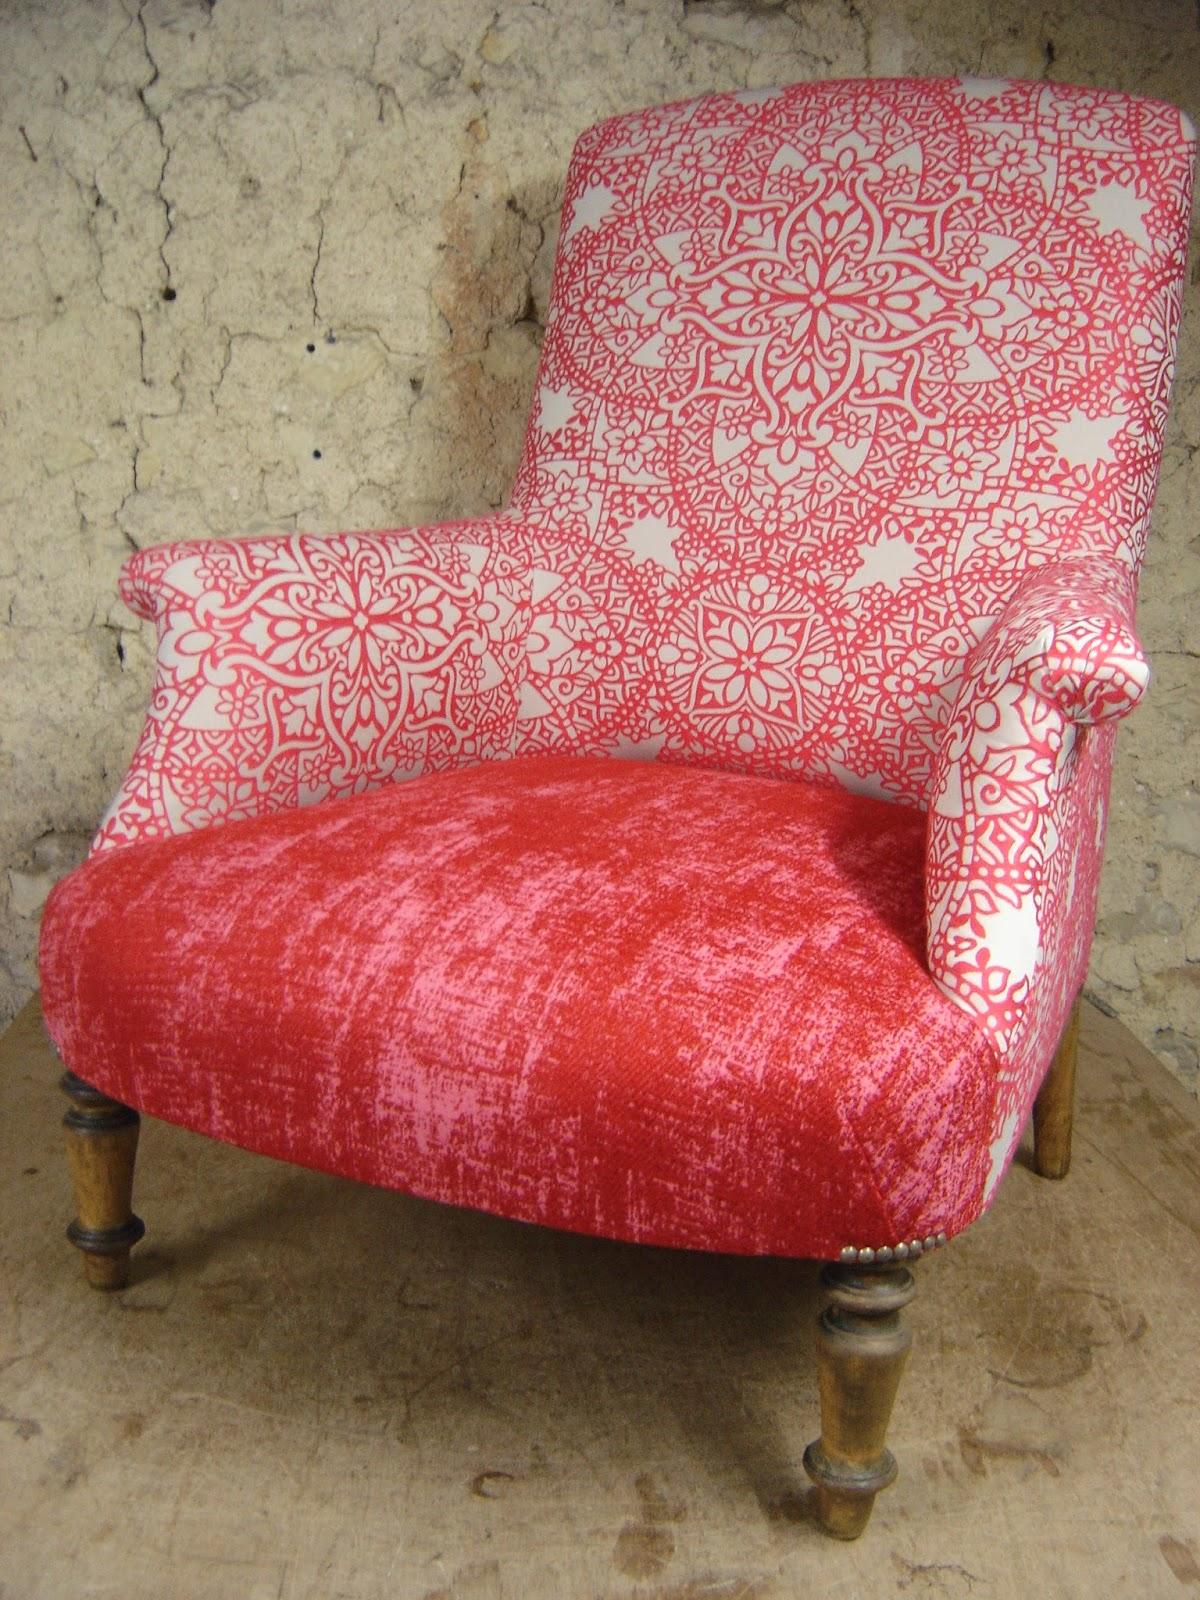 Christine rose artisan tapissier r alisations for Abonnement art et decoration